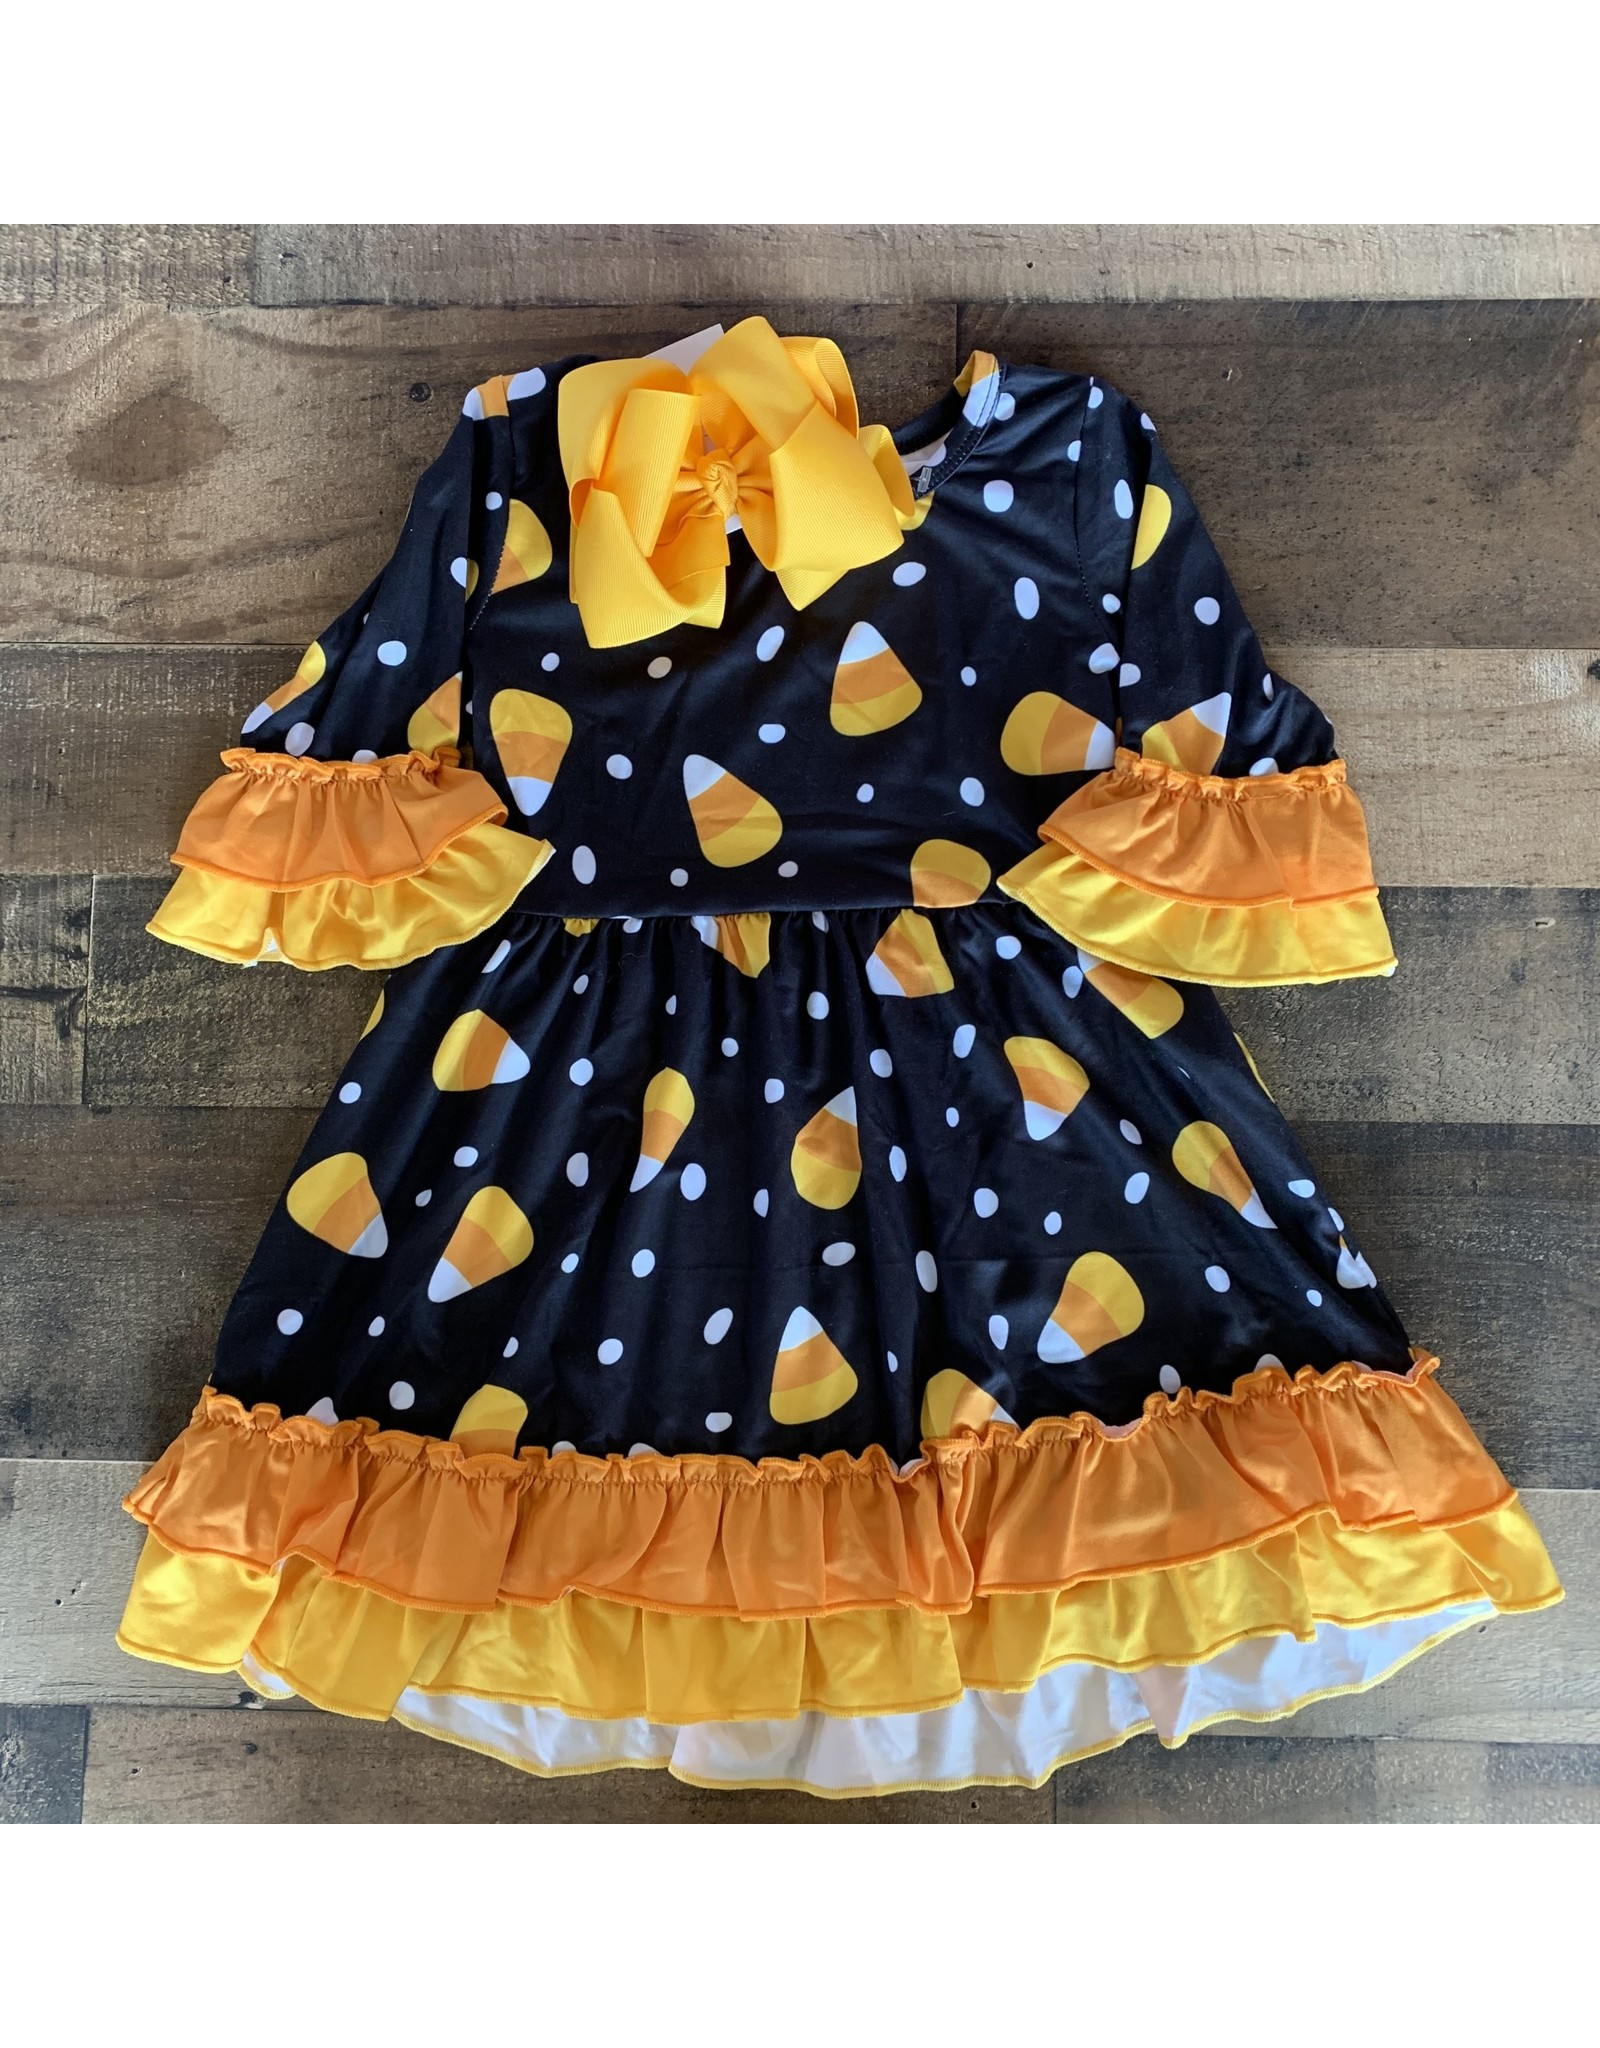 Candy Corn Black Ruffle Dress